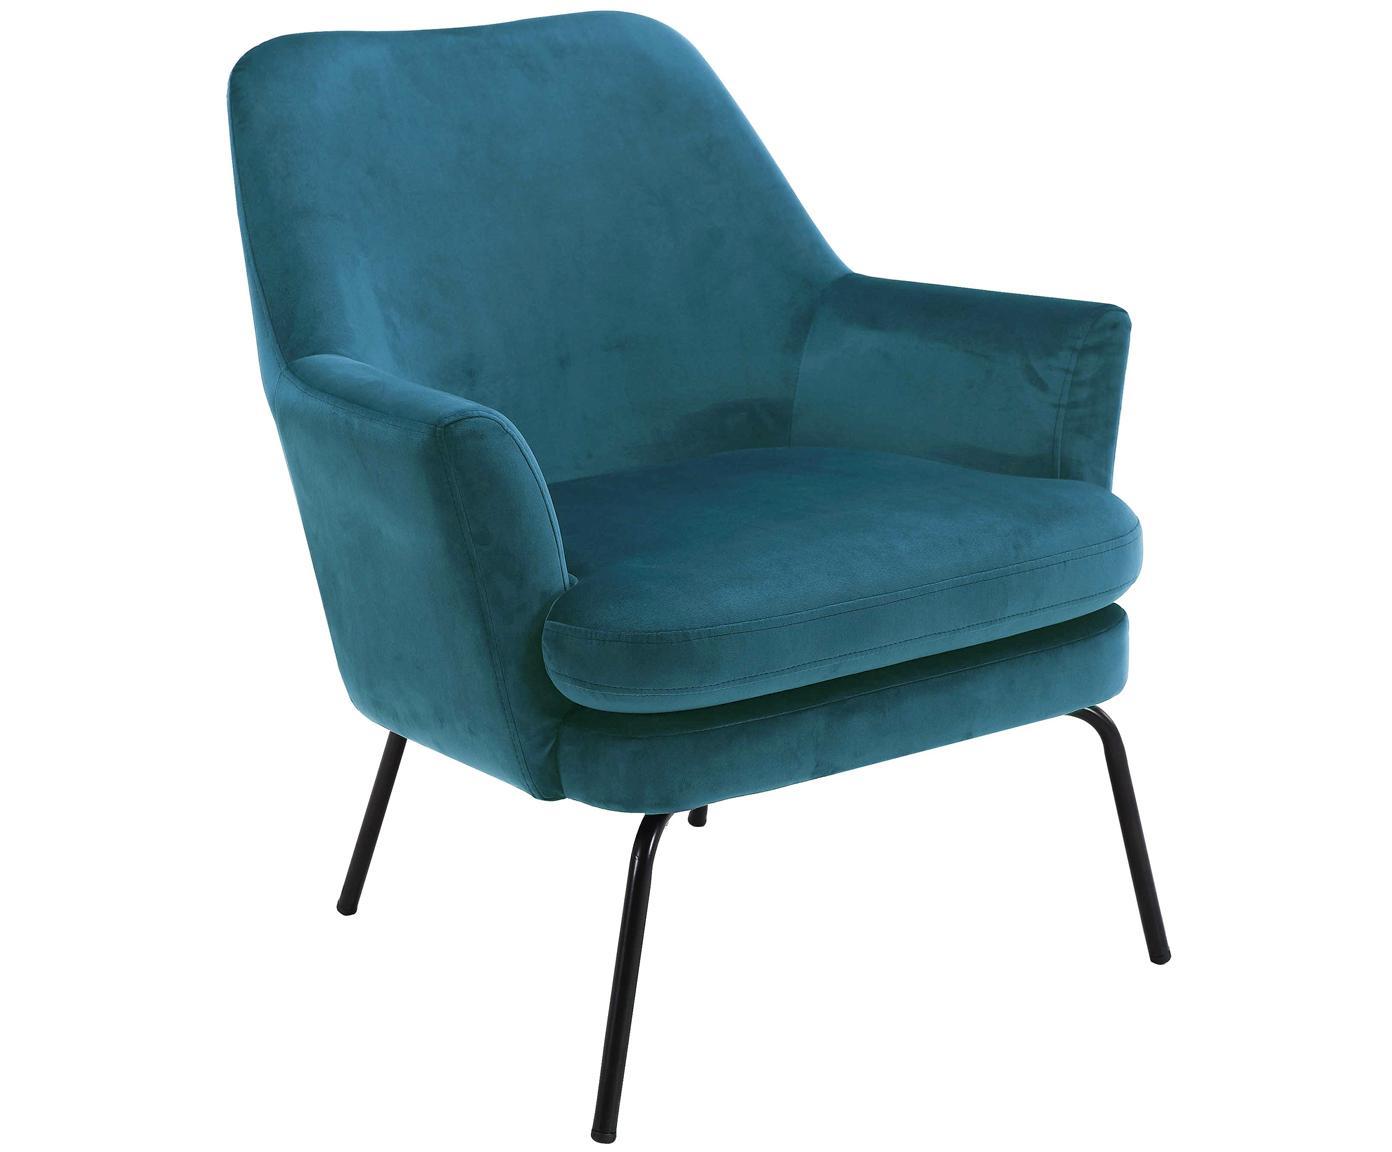 Fotel z aksamitu Chisa, Tapicerka: poliester (aksamit) Tkani, Nogi: metal malowany proszkowo, Marynarski granat, S 58 x G 50 cm